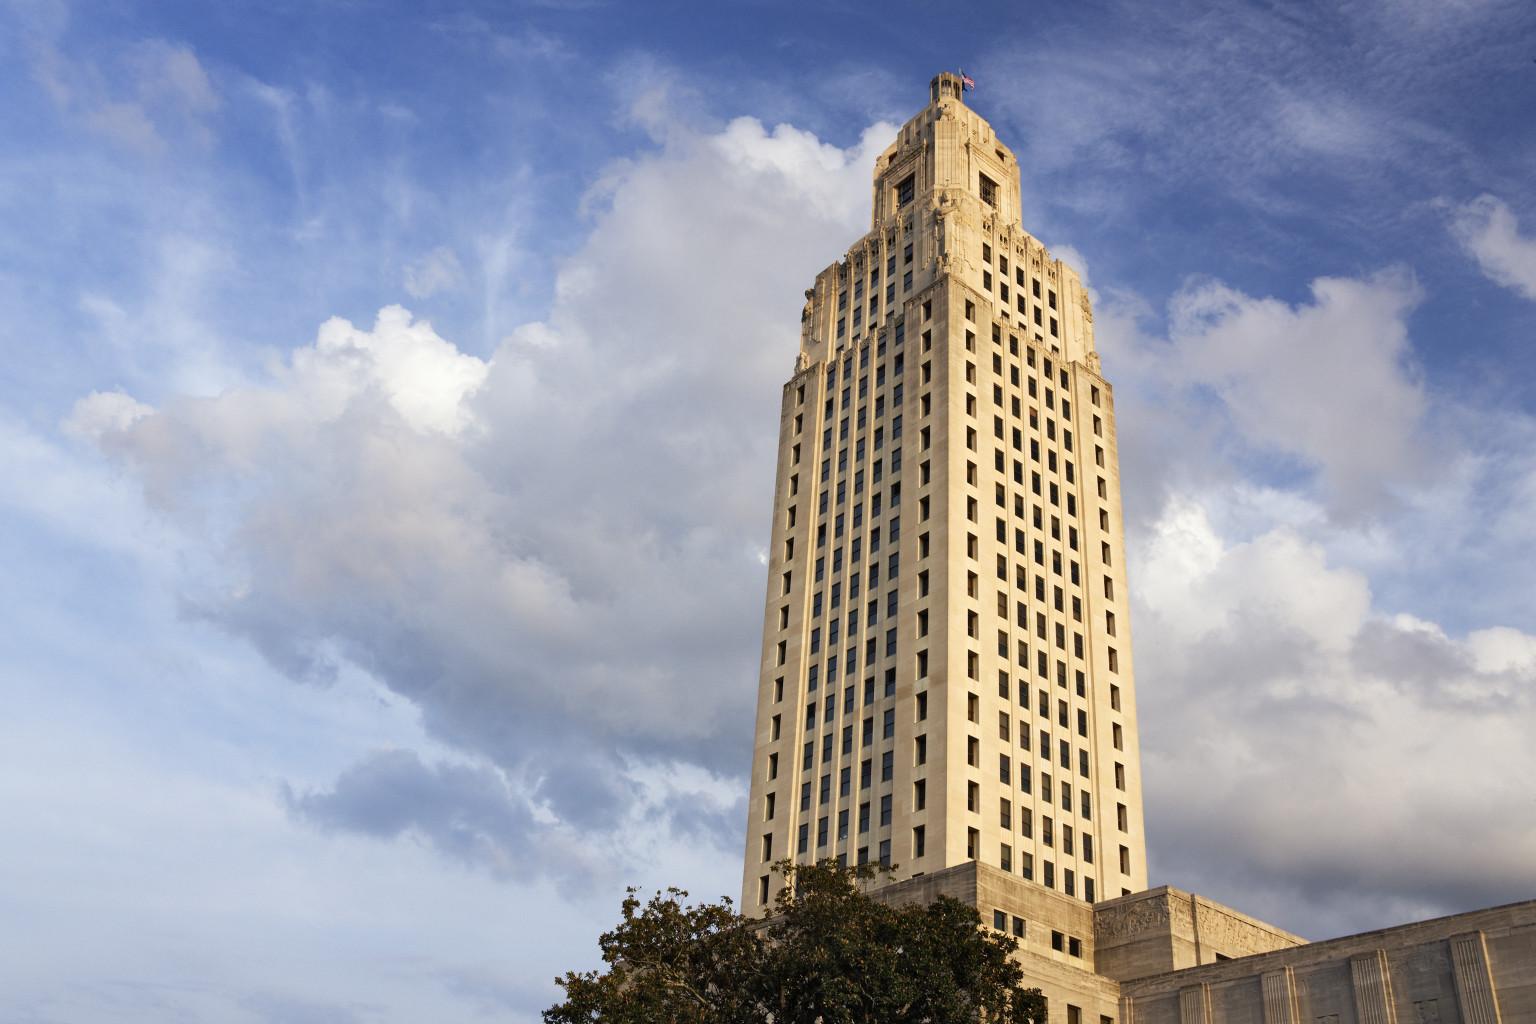 Louisianas woman problem state ranks dead last in female louisianas woman problem state ranks dead last in female representation huffpost sciox Choice Image